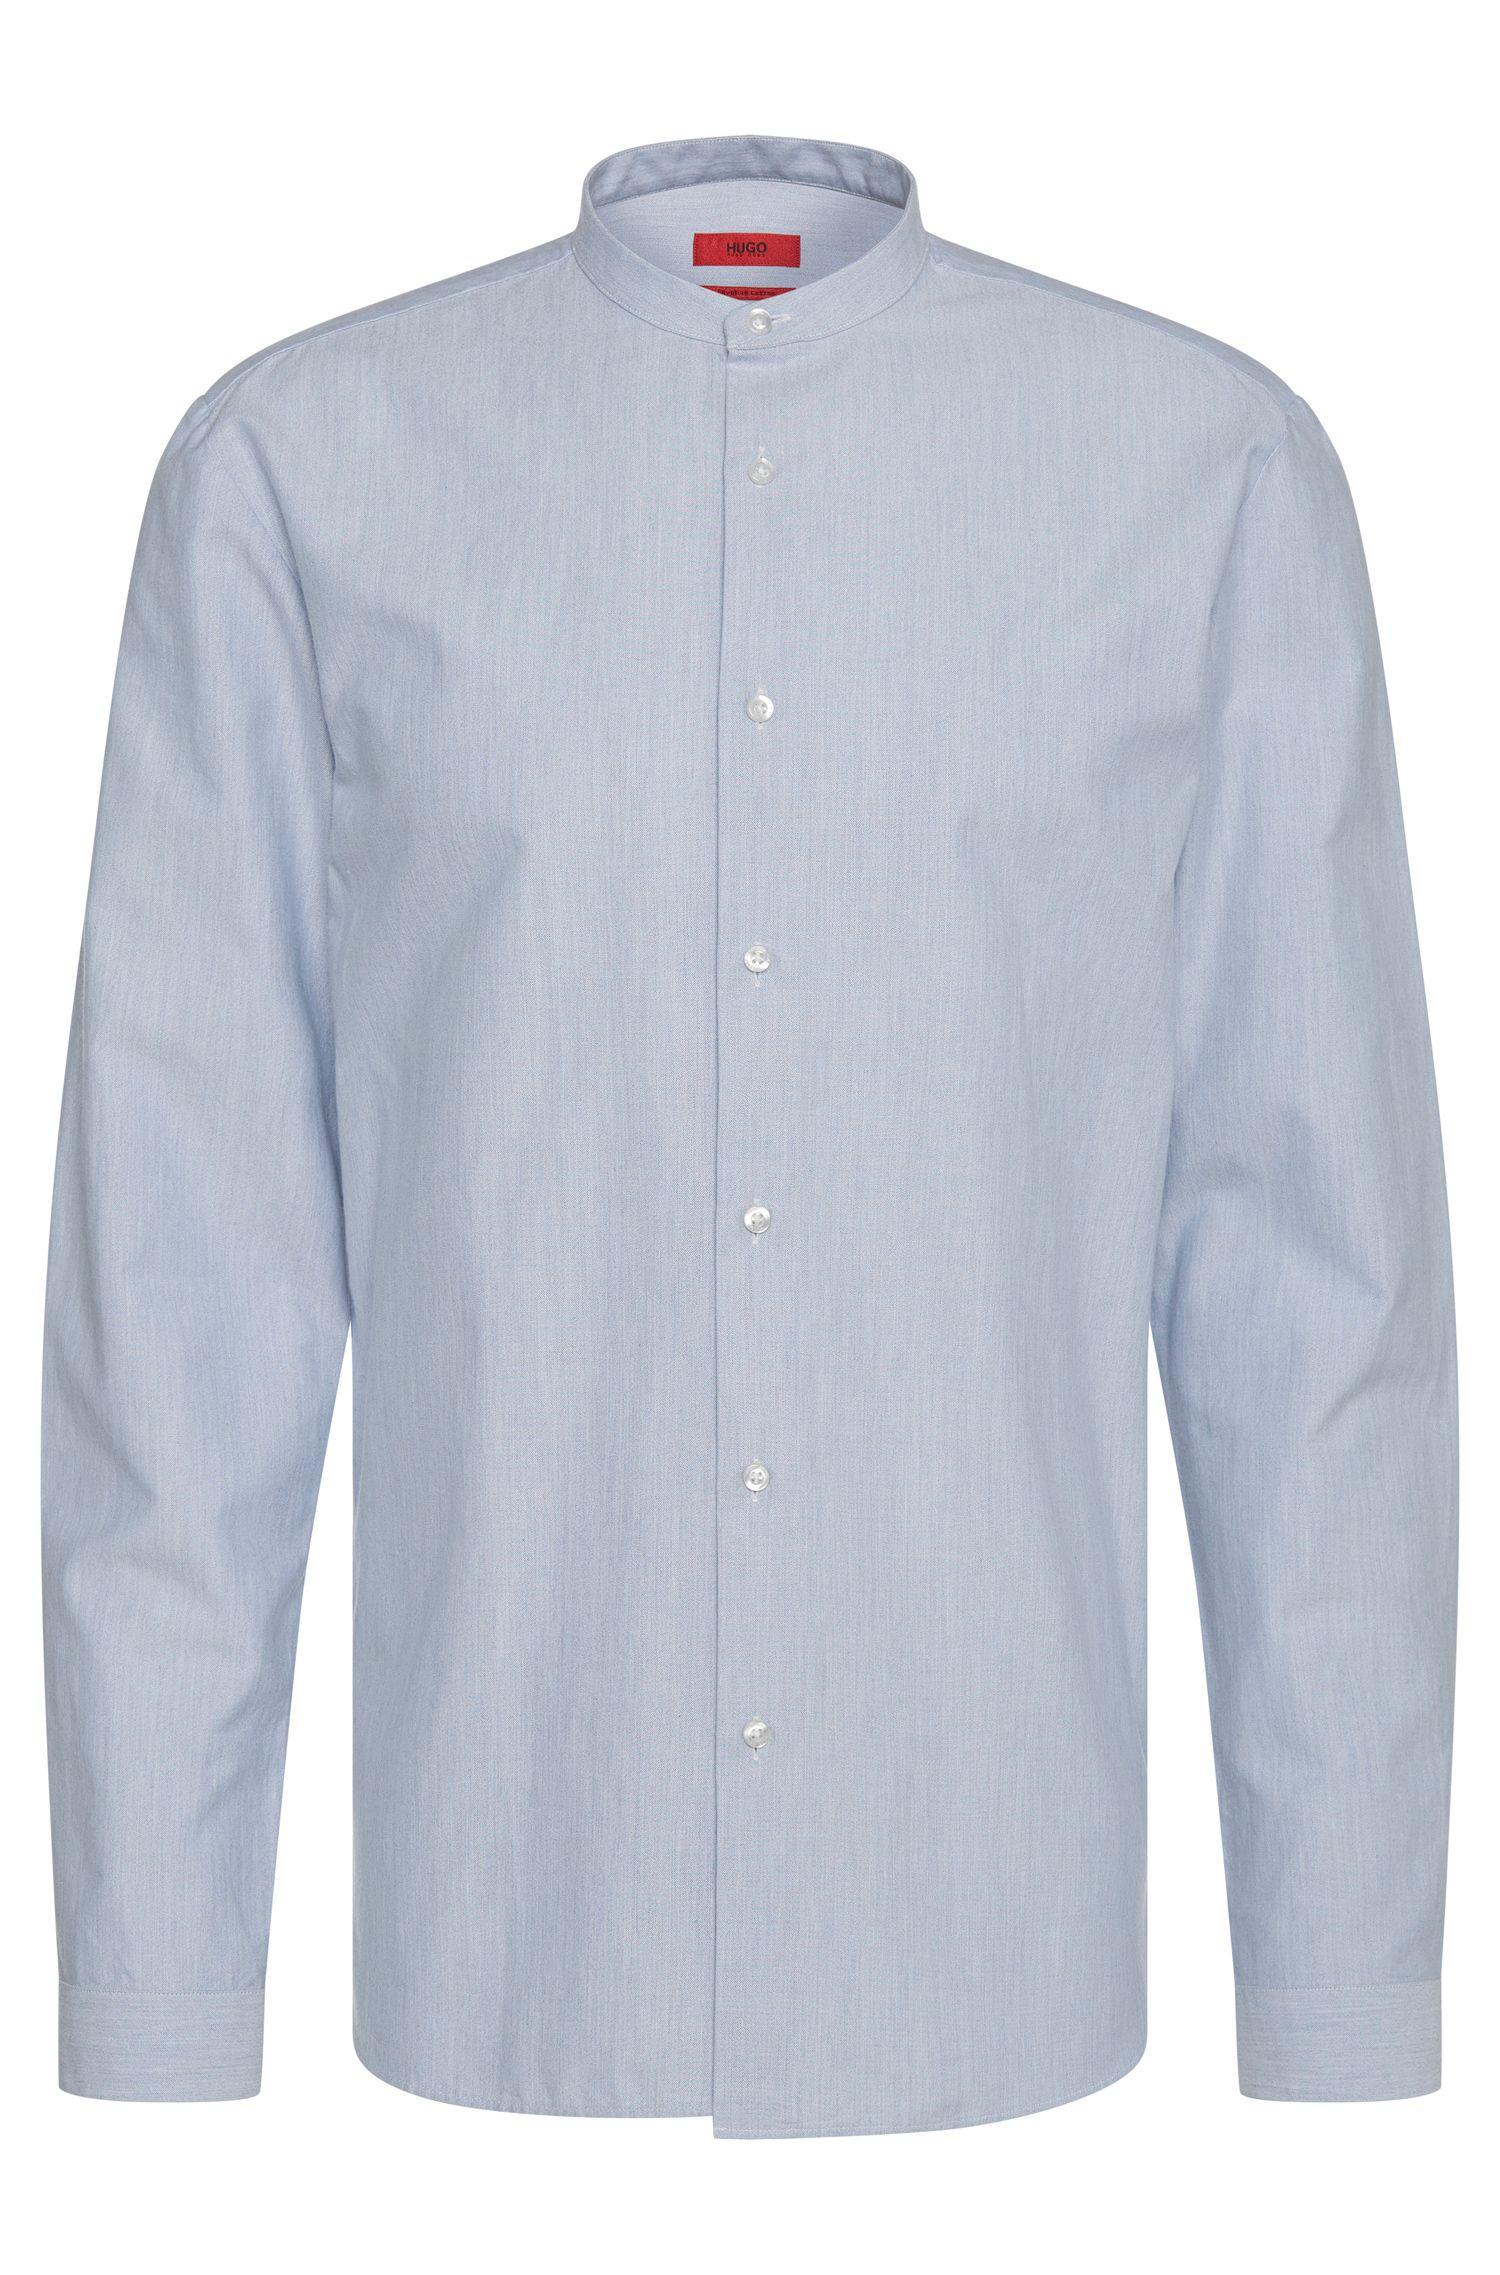 'Eddison'   Regular Fit, Cotton Button Down Shirt